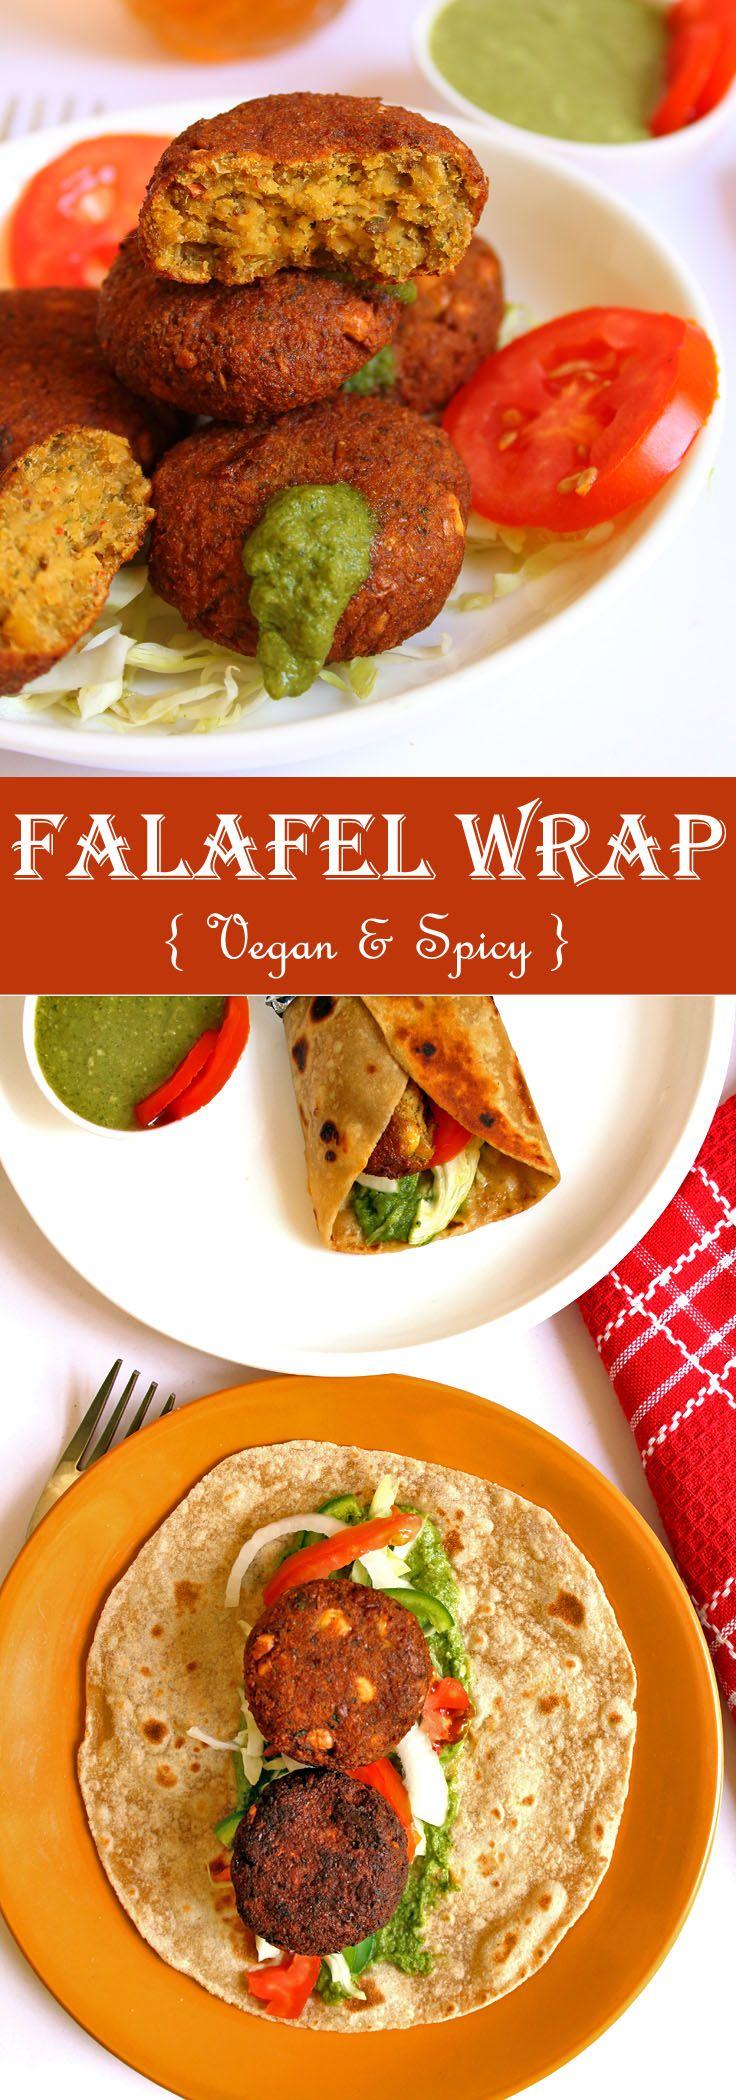 how to make lebanese falafel wrap